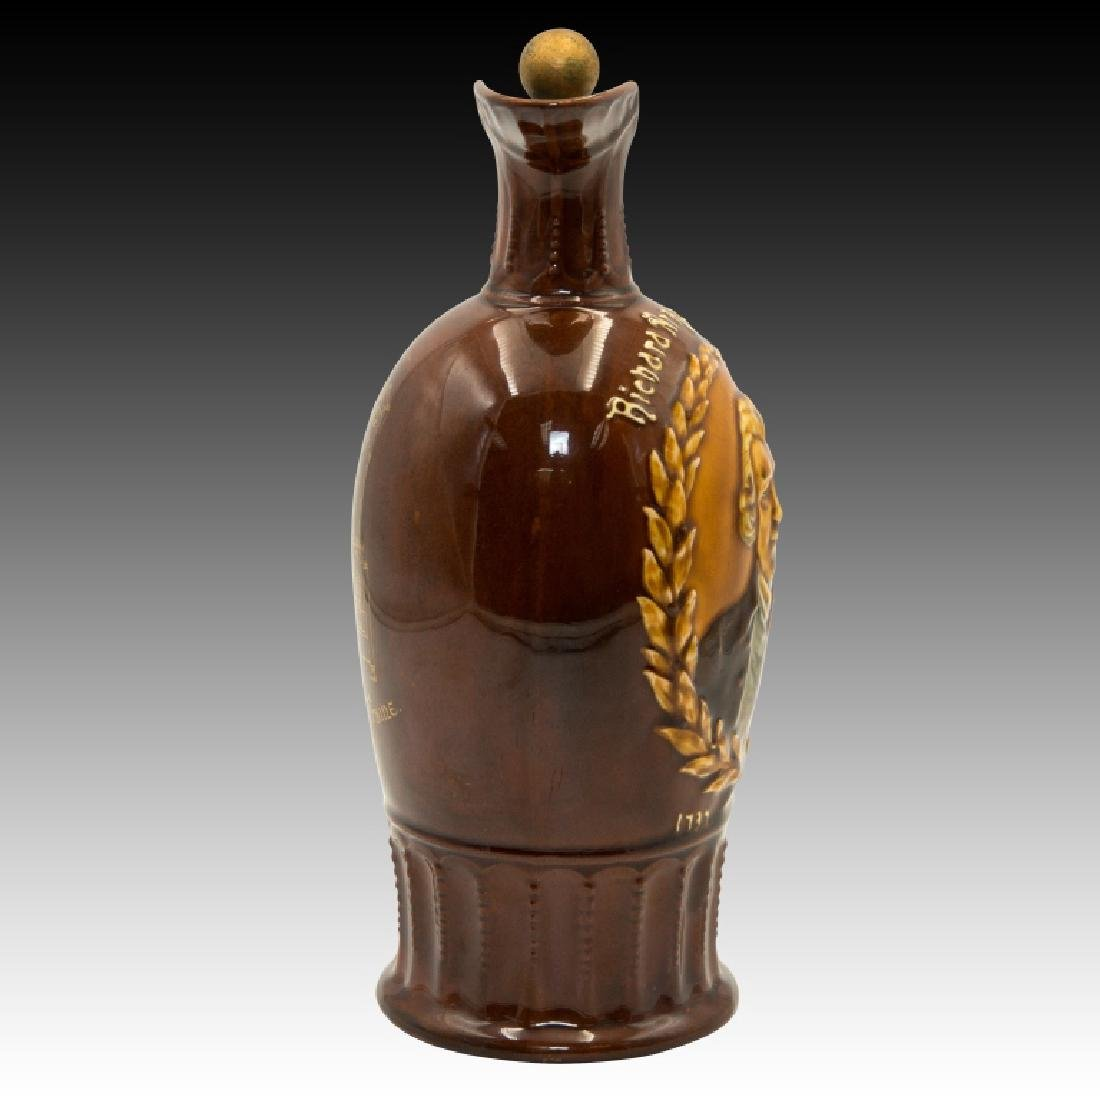 Doulton Kingsware Dewar's Richard Arkwright Flask - 2